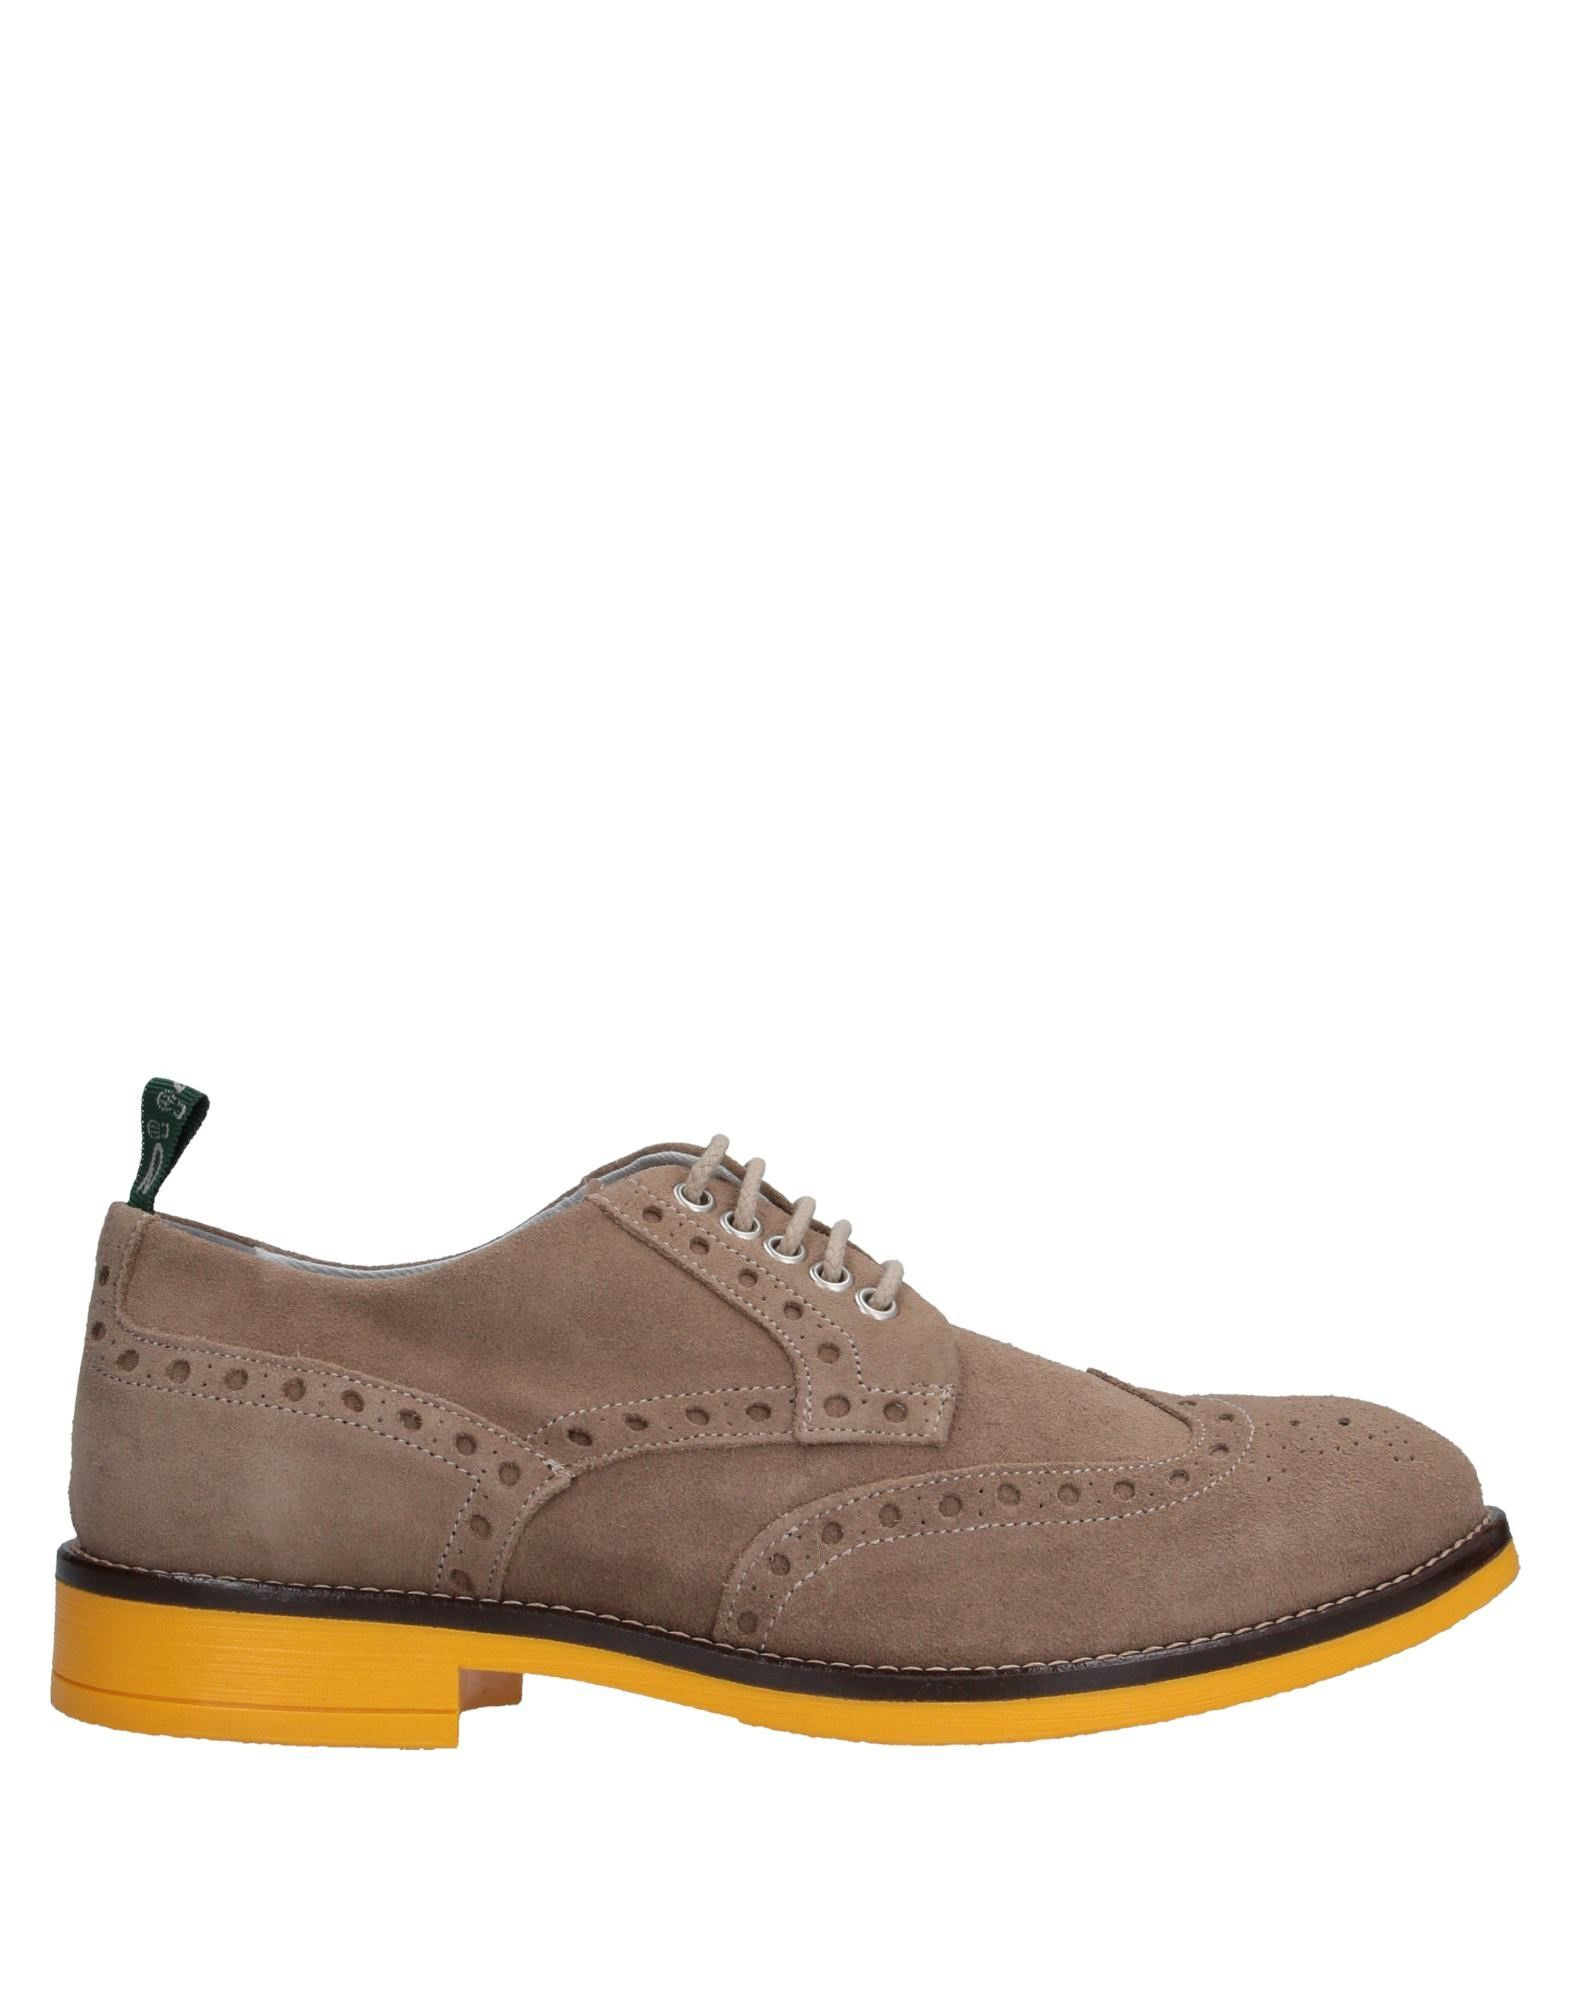 DOUBLES 4 YOU® Обувь на шнурках